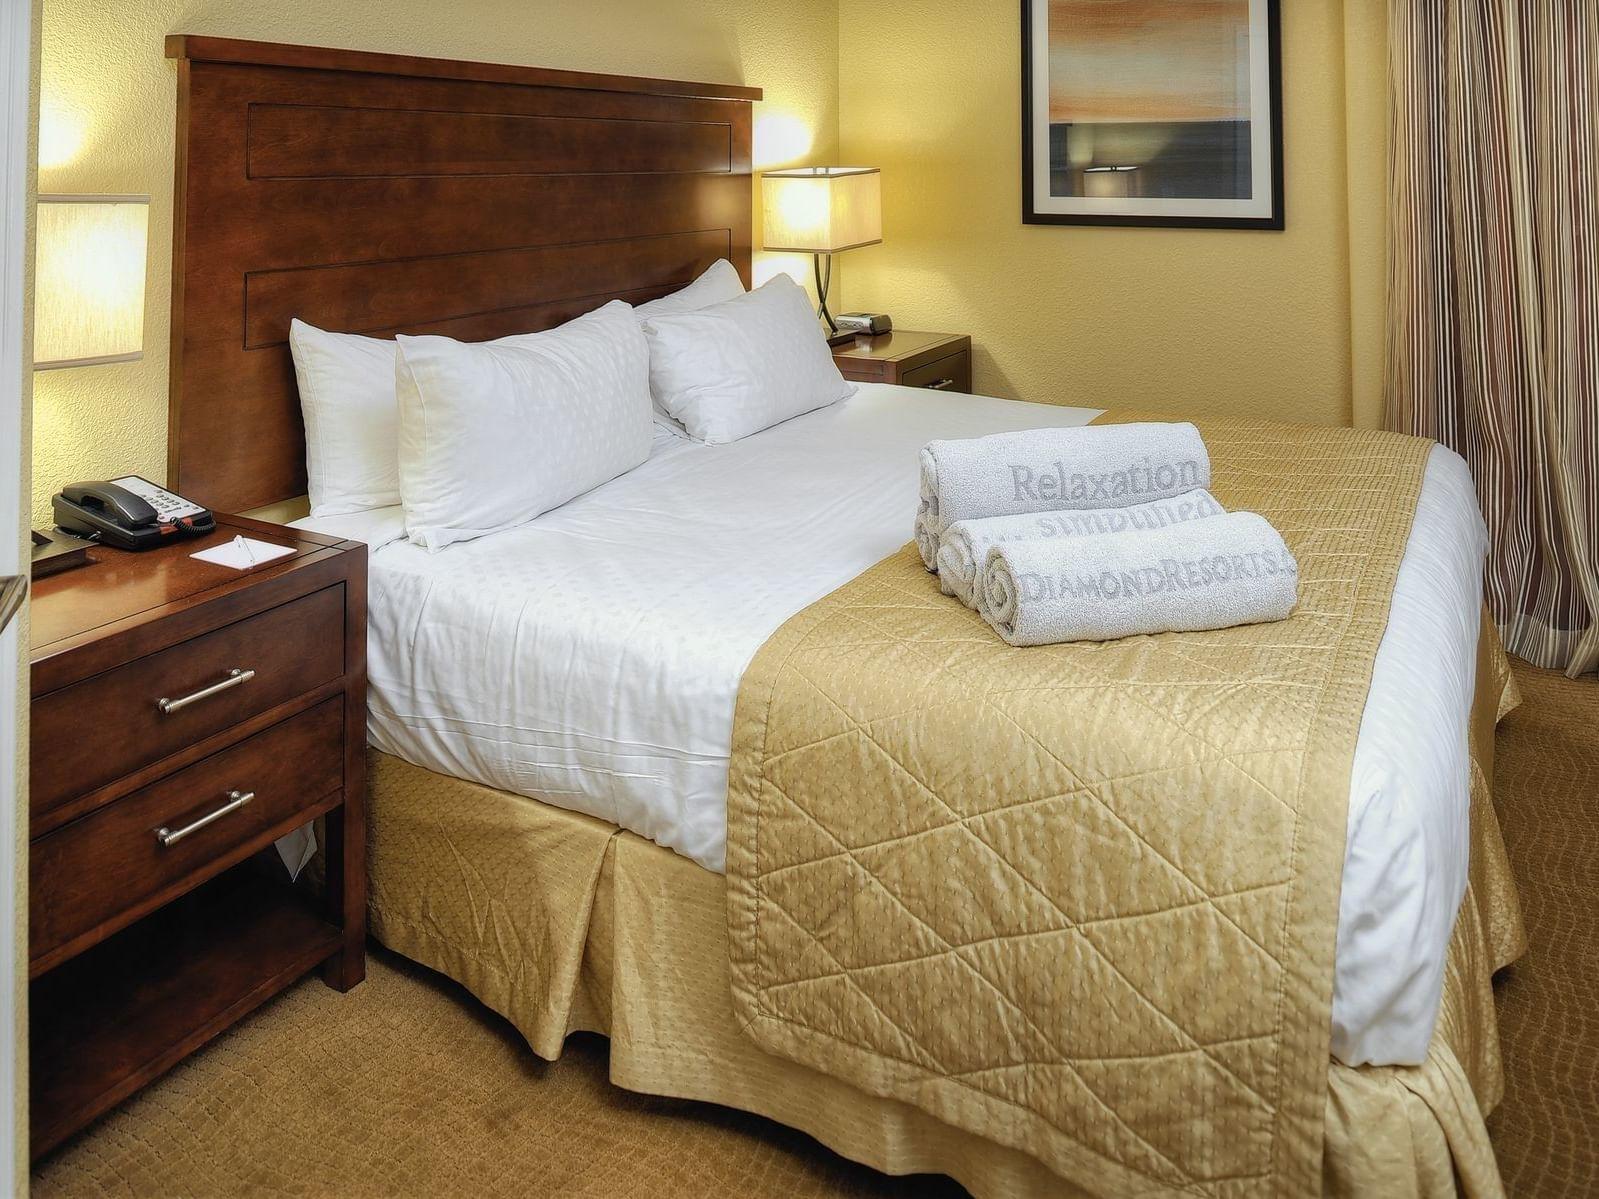 Luxury bed of One Bedroom Suite at Diamond Sedona Portal Hotel